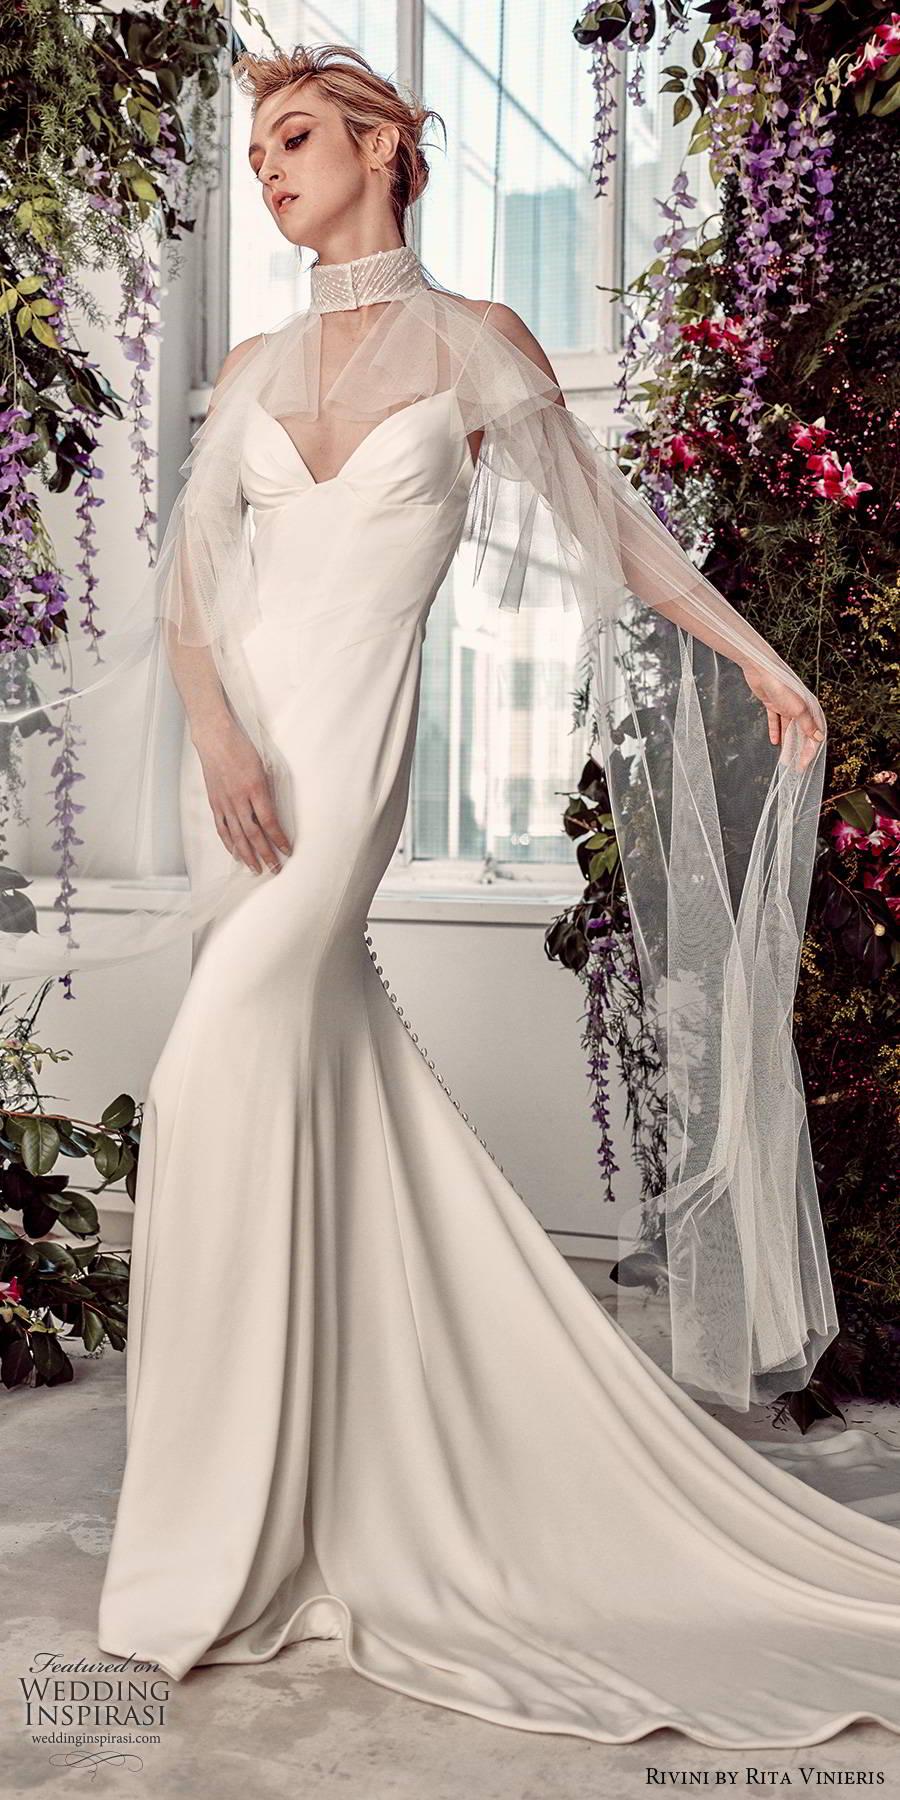 rivini by rita vinieris spring 2020 bridal sleeveless thin straps sweetheart minimally embellished modern clean sheath wedding dress sheer cape chapel train (12) mv